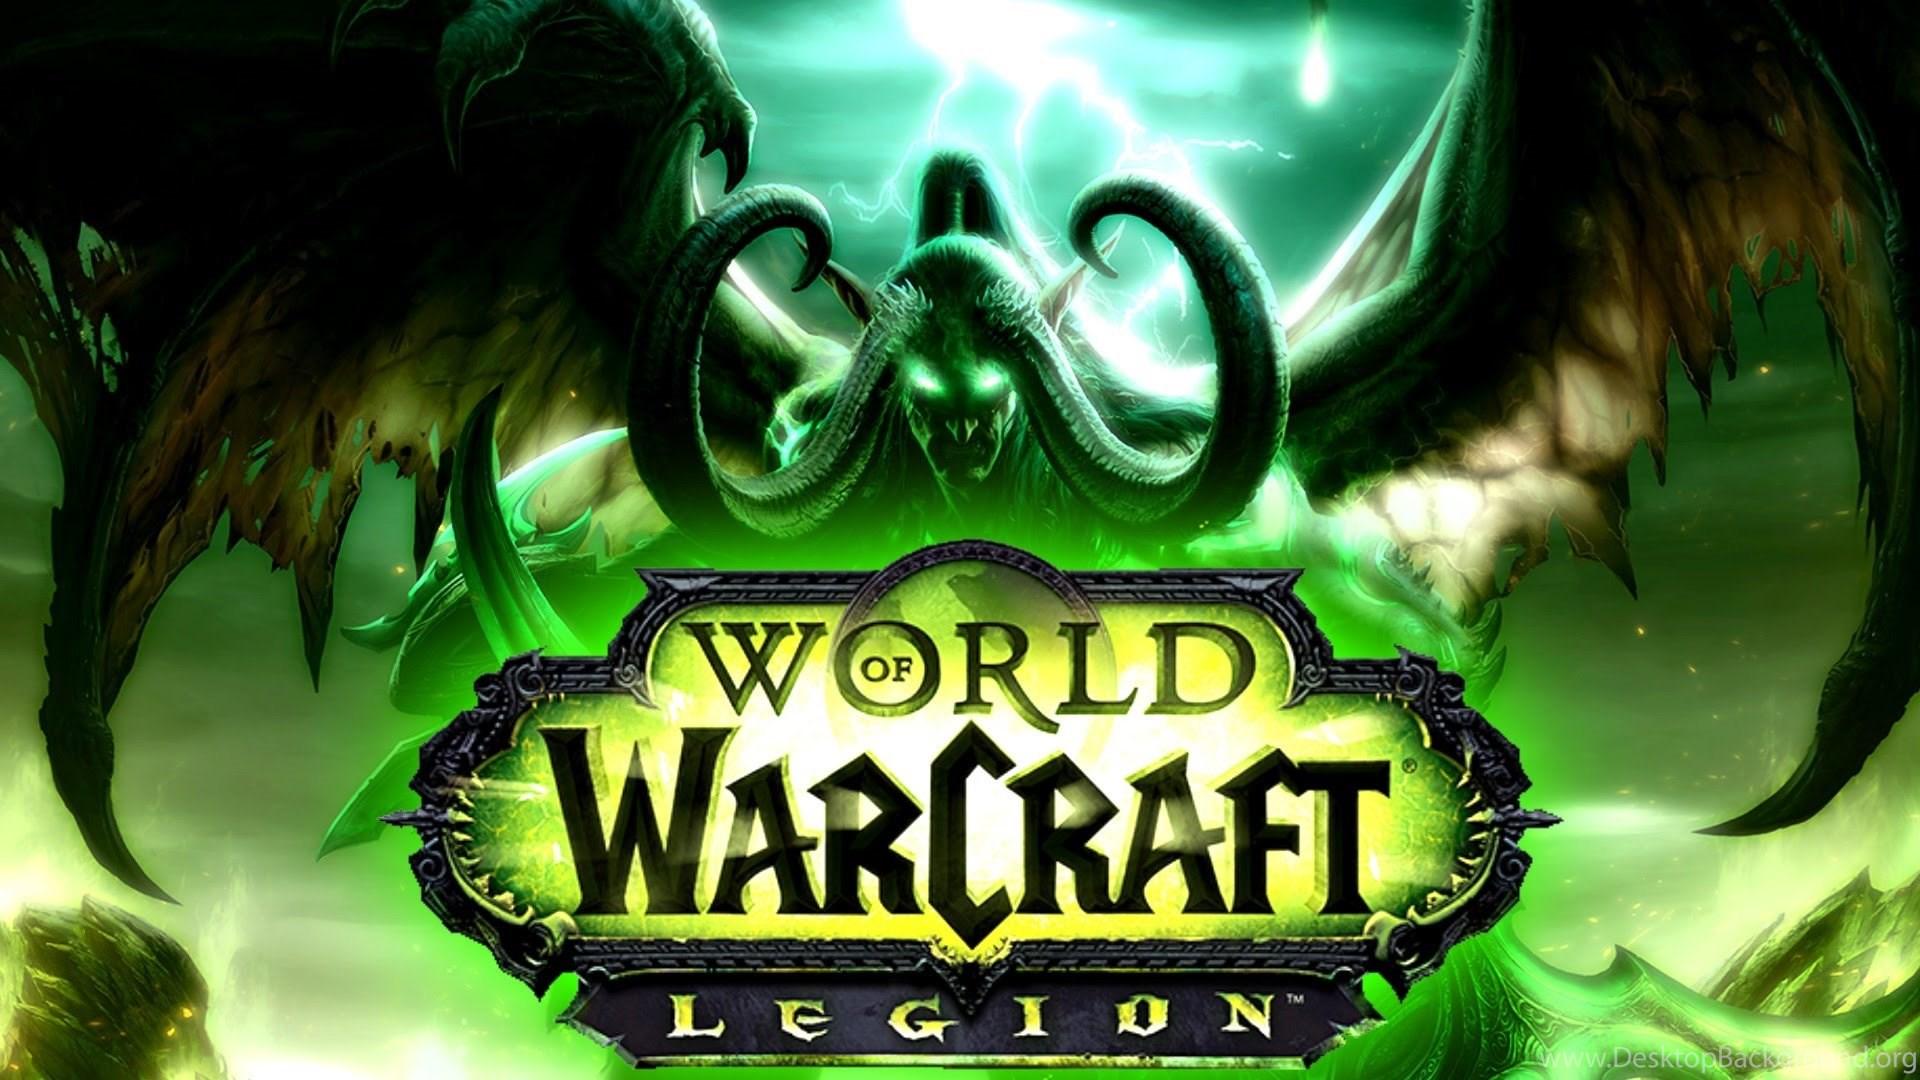 World Of Warcraft Legion Hd Wallpapers Free Download Desktop